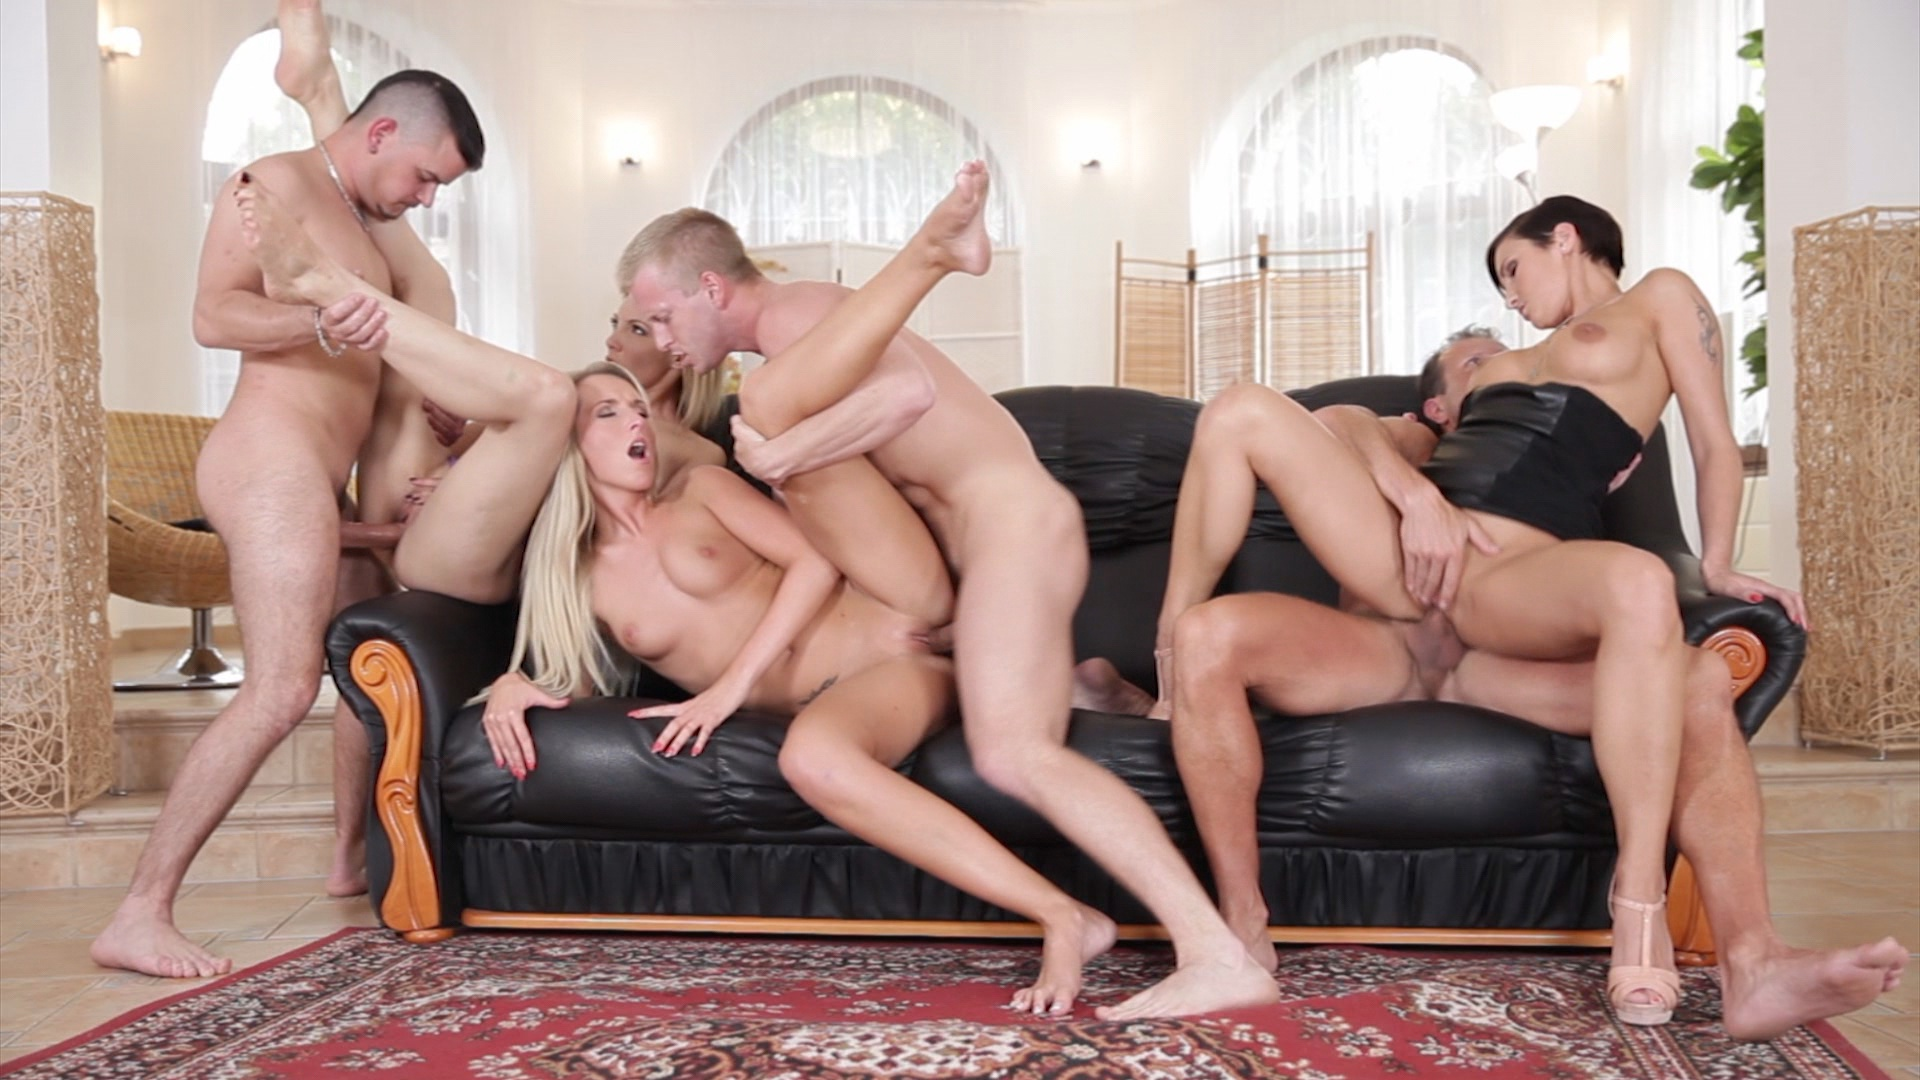 Swingers Orgies 8 xvideos178655